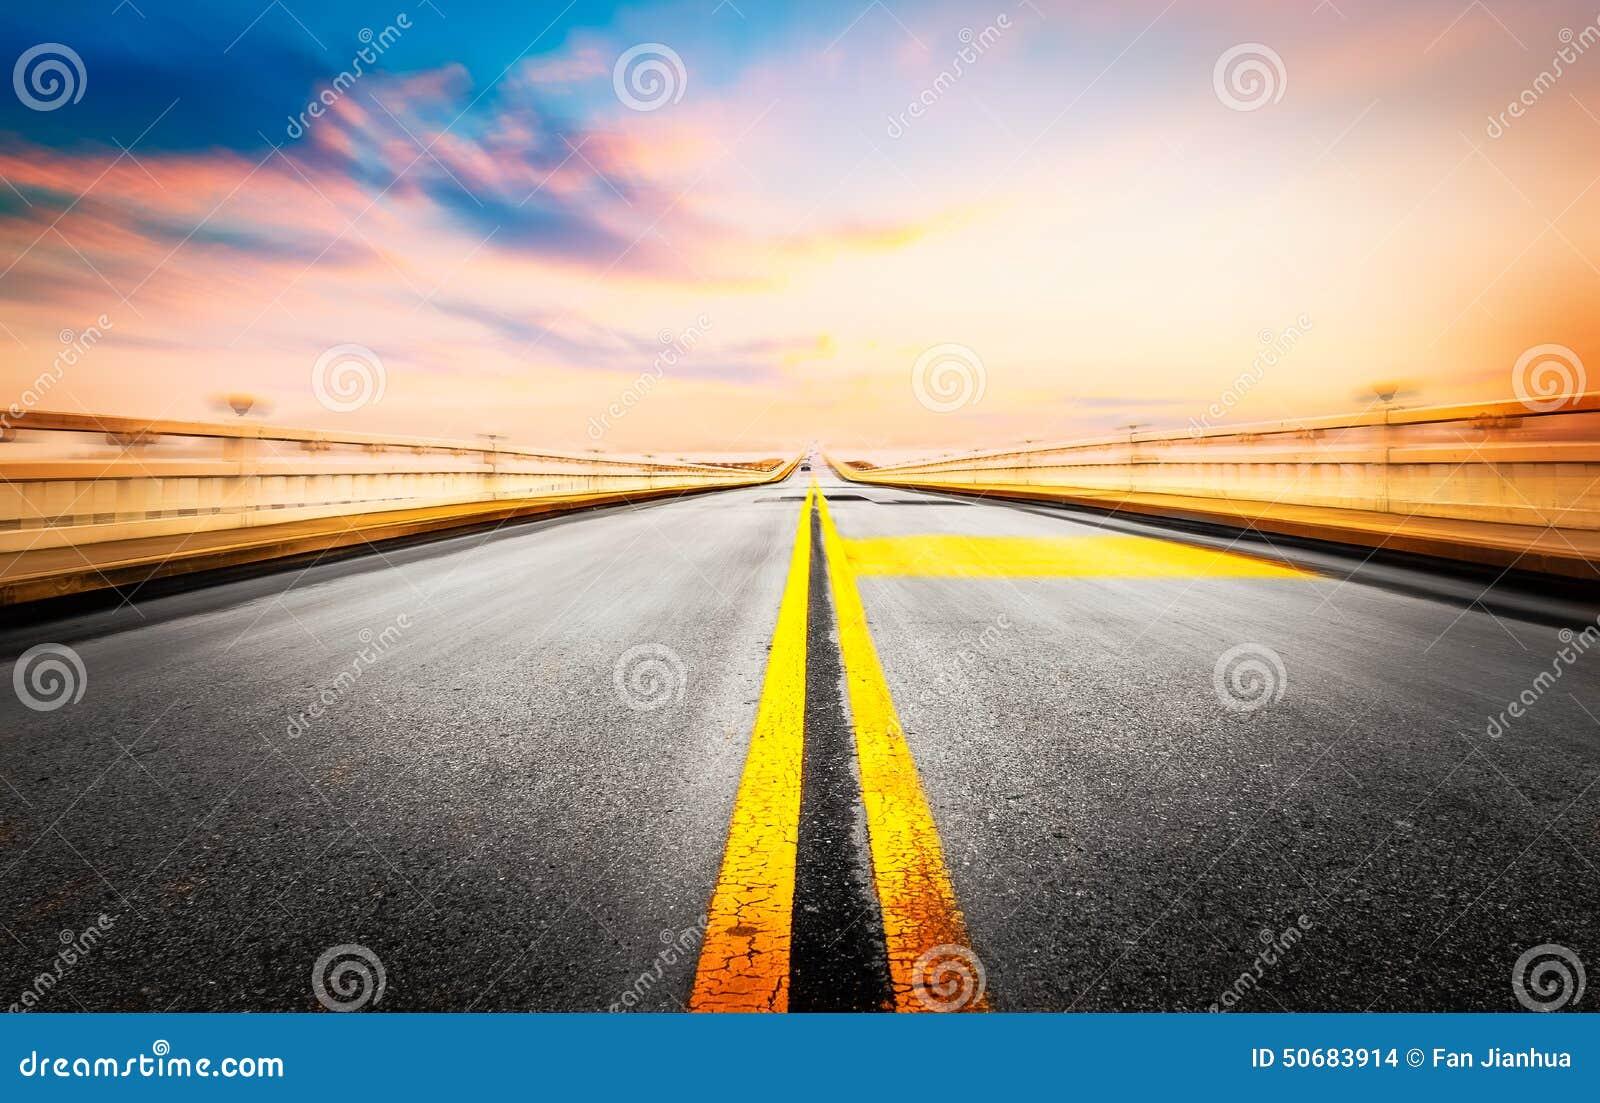 Download 现代建筑学背景和路 库存照片. 图片 包括有 云彩, 汽车, 业务量, 繁忙, 室外, 标号, 转接, 模糊 - 50683914